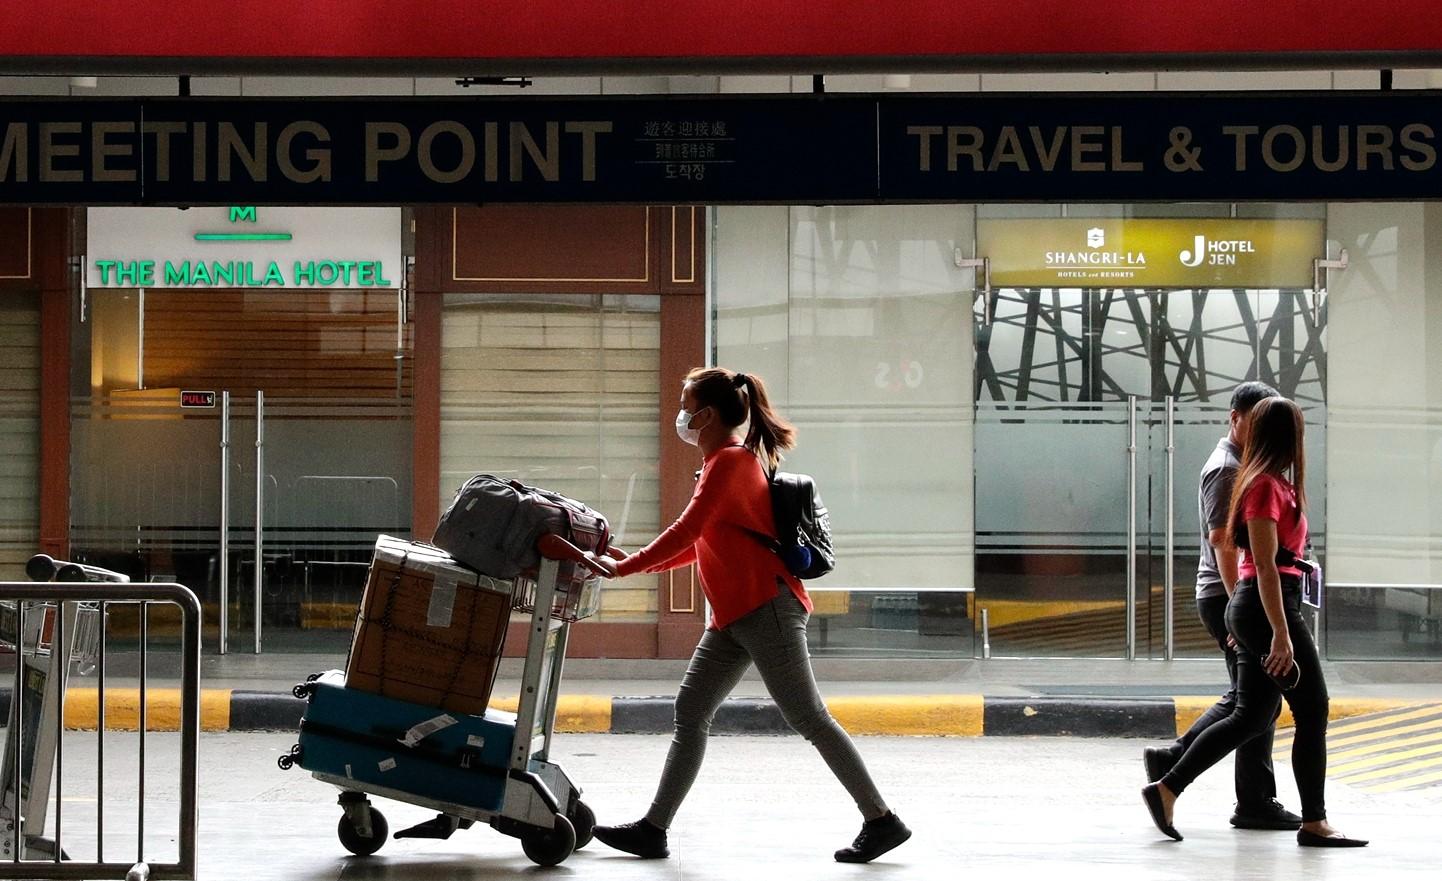 Philippines Q1 tourism revenue dips 35% due to COVID-19